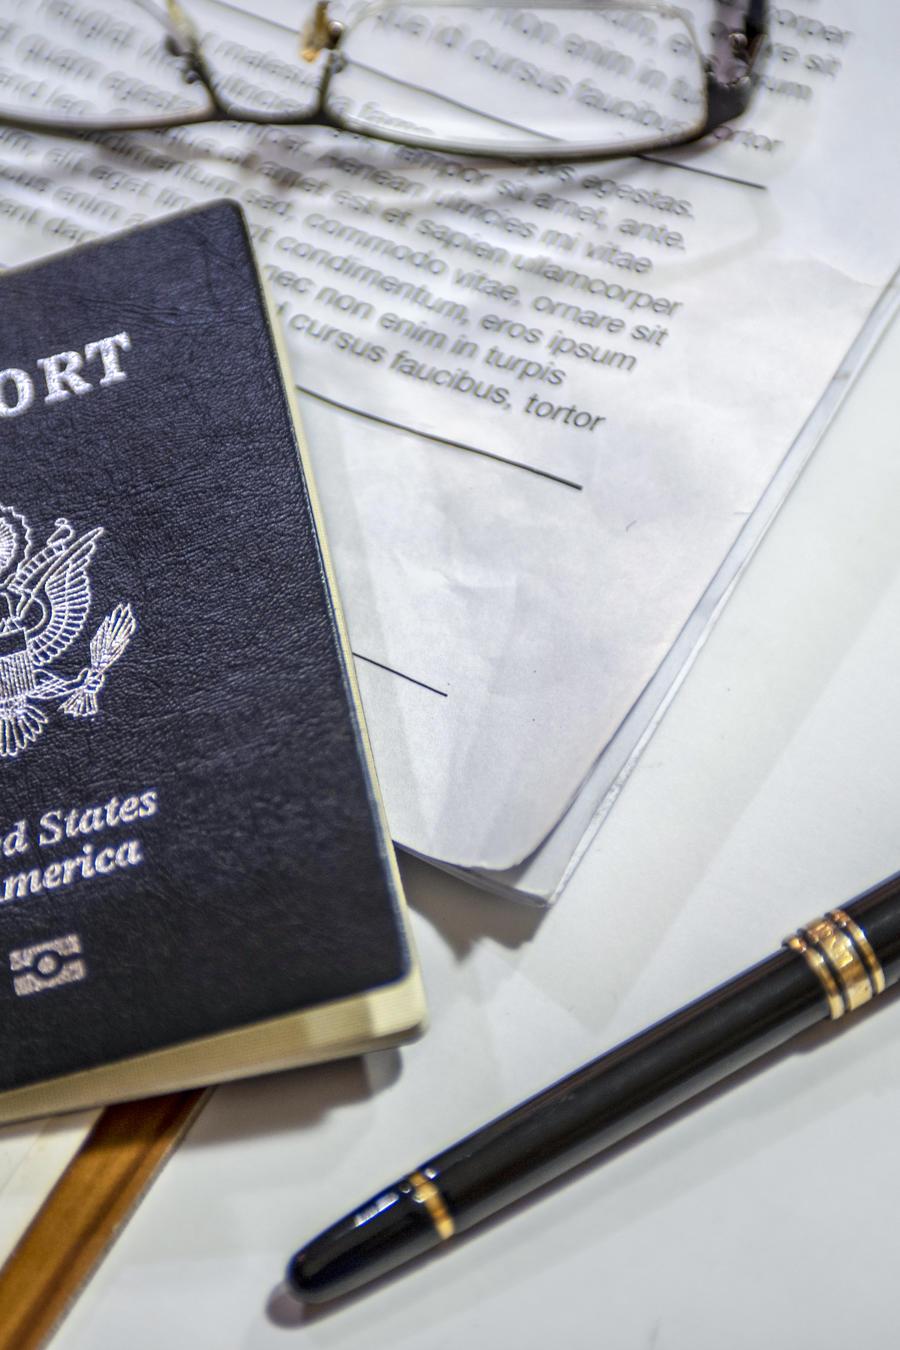 Passport on the desk of an American businessman